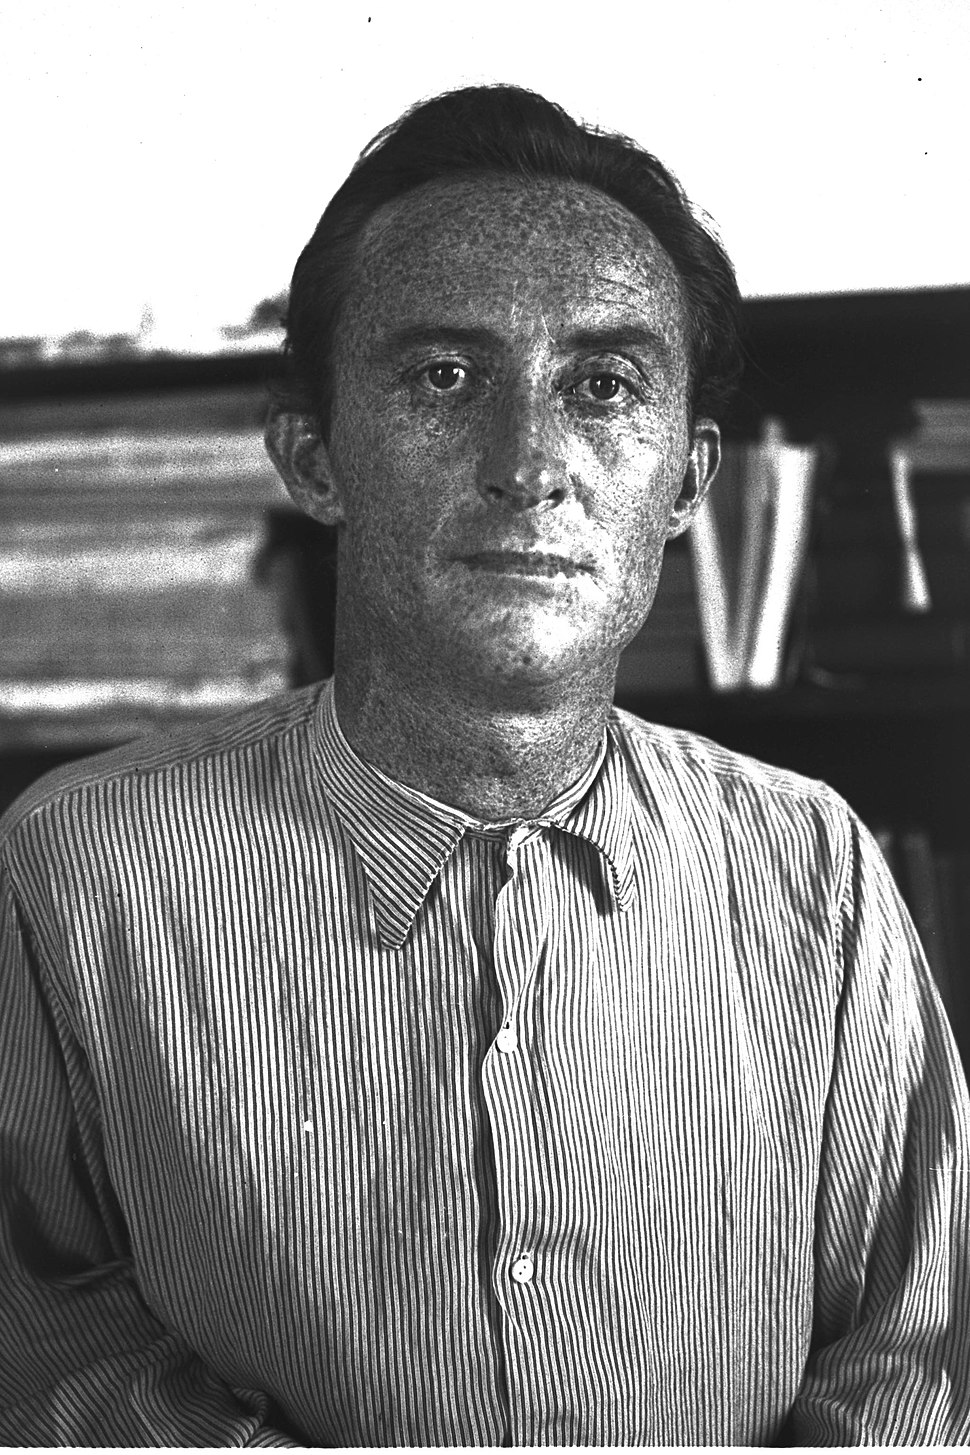 HEBREW POET AND WRITER URI ZVI GRINBERG. המשורר אורי צבי גרינברג.D22-093